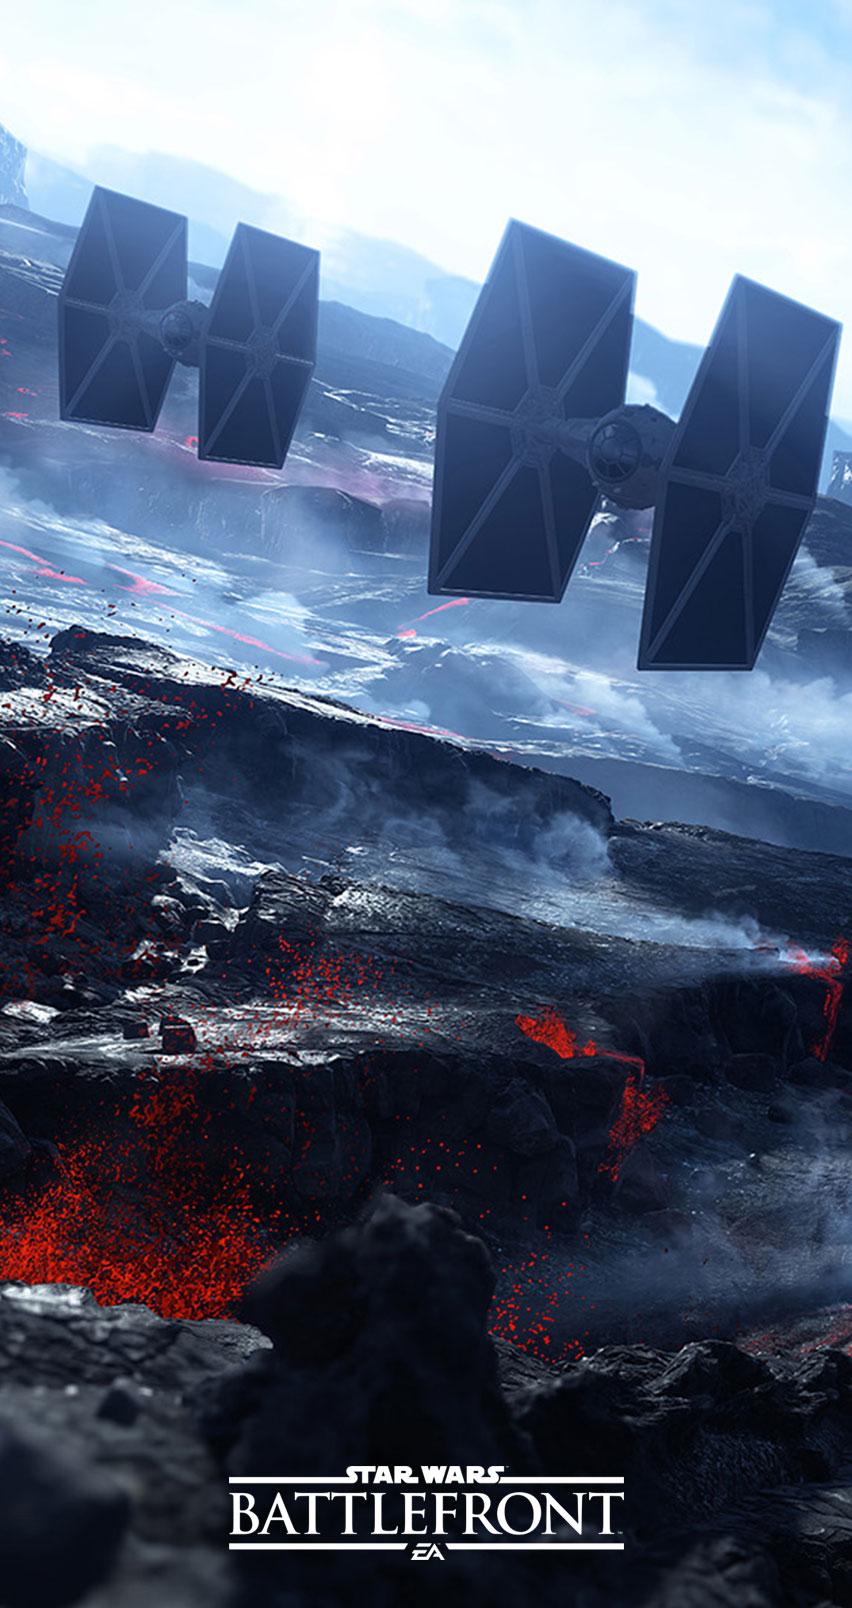 Star Wars Battlefront 2 Phone 852x1608 Download Hd Wallpaper Wallpapertip